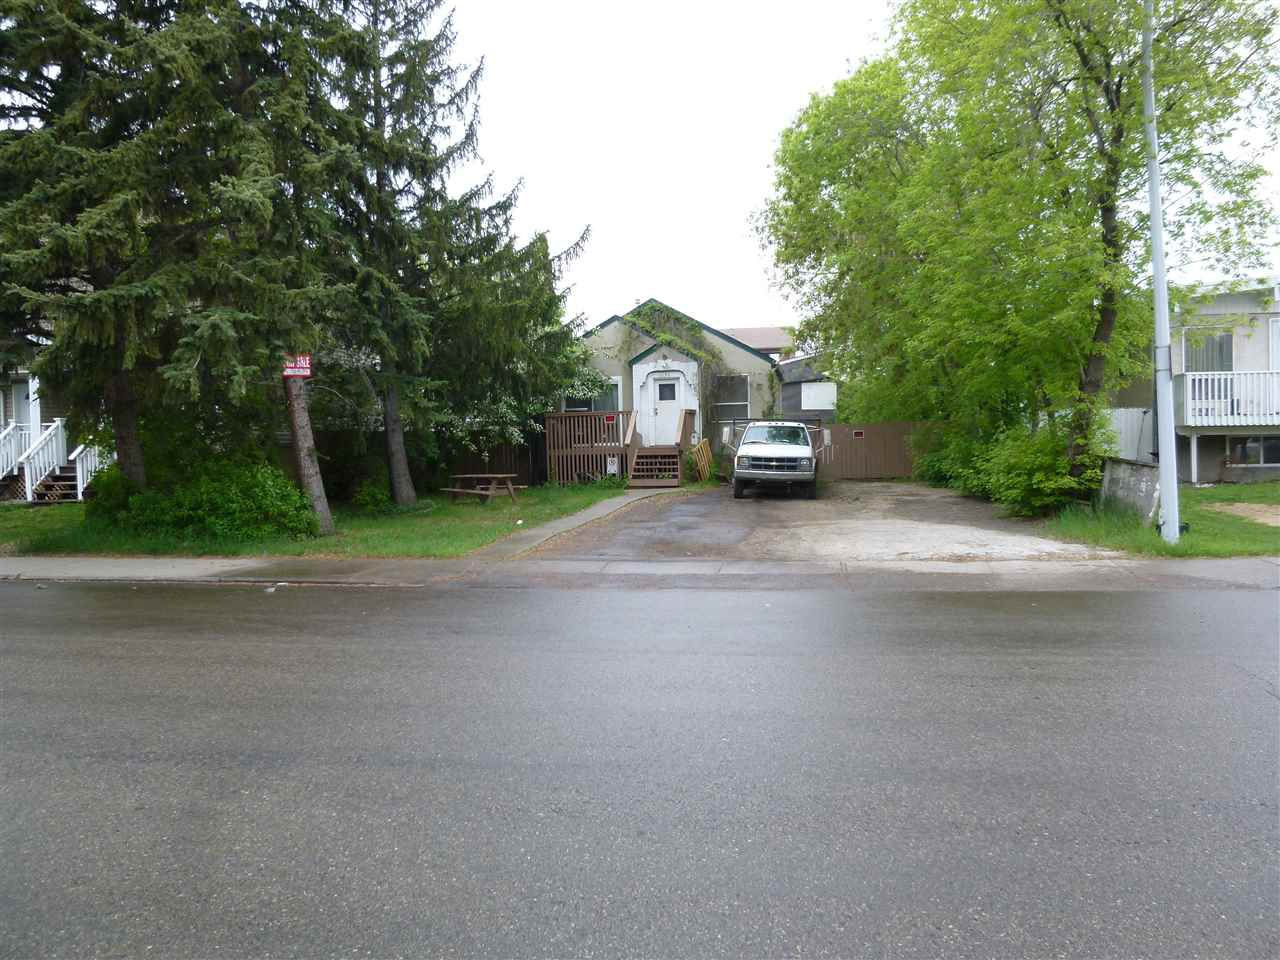 Main Photo: 10150 159 Street in Edmonton: Zone 21 Multi-Family Commercial for sale : MLS®# E4158996